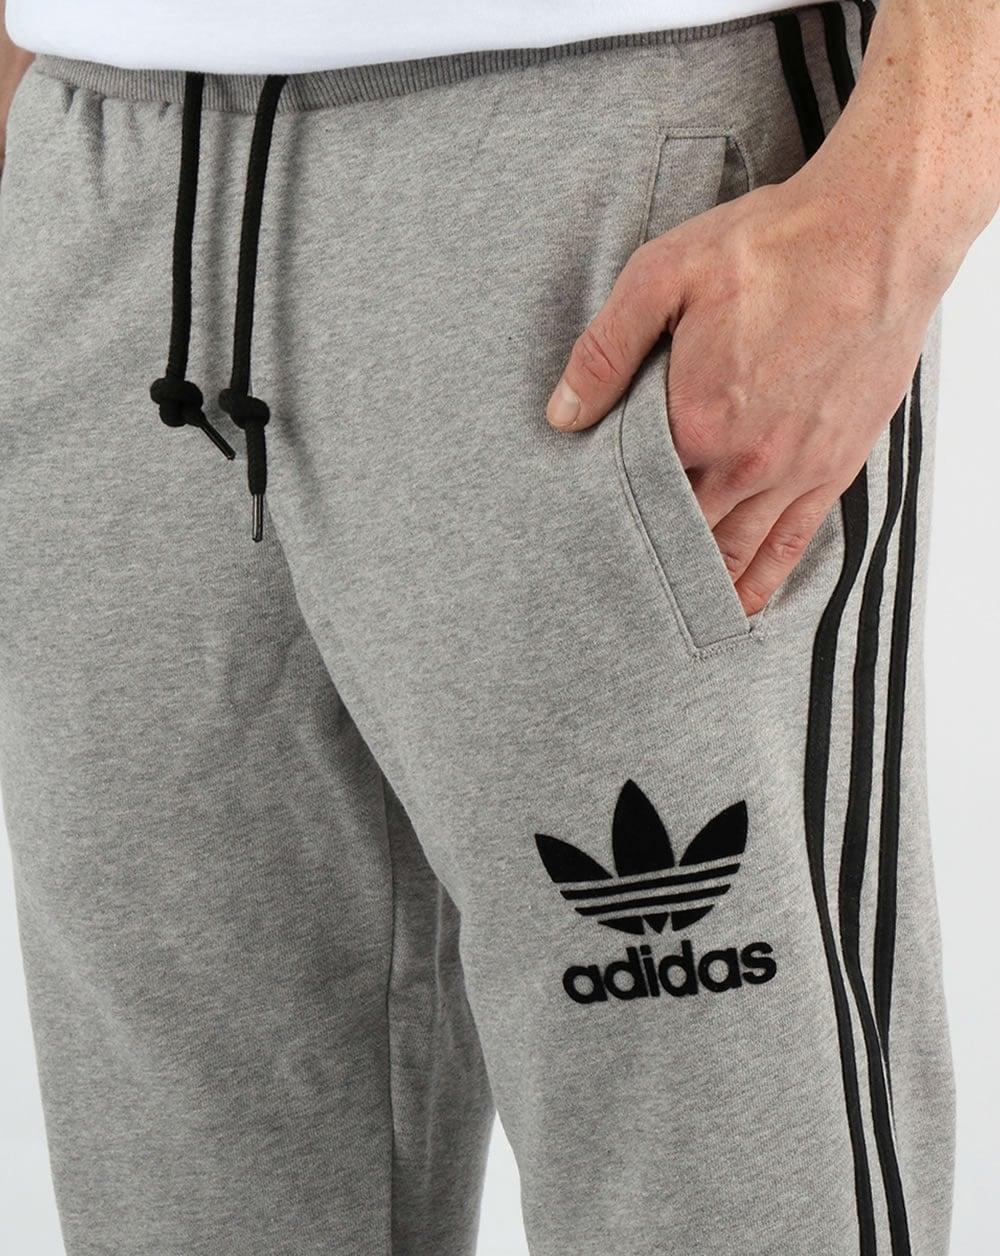 3 Stripe Short - Grey adidas Originals Sale 2018 New Enjoy Sale Online NibbsvY